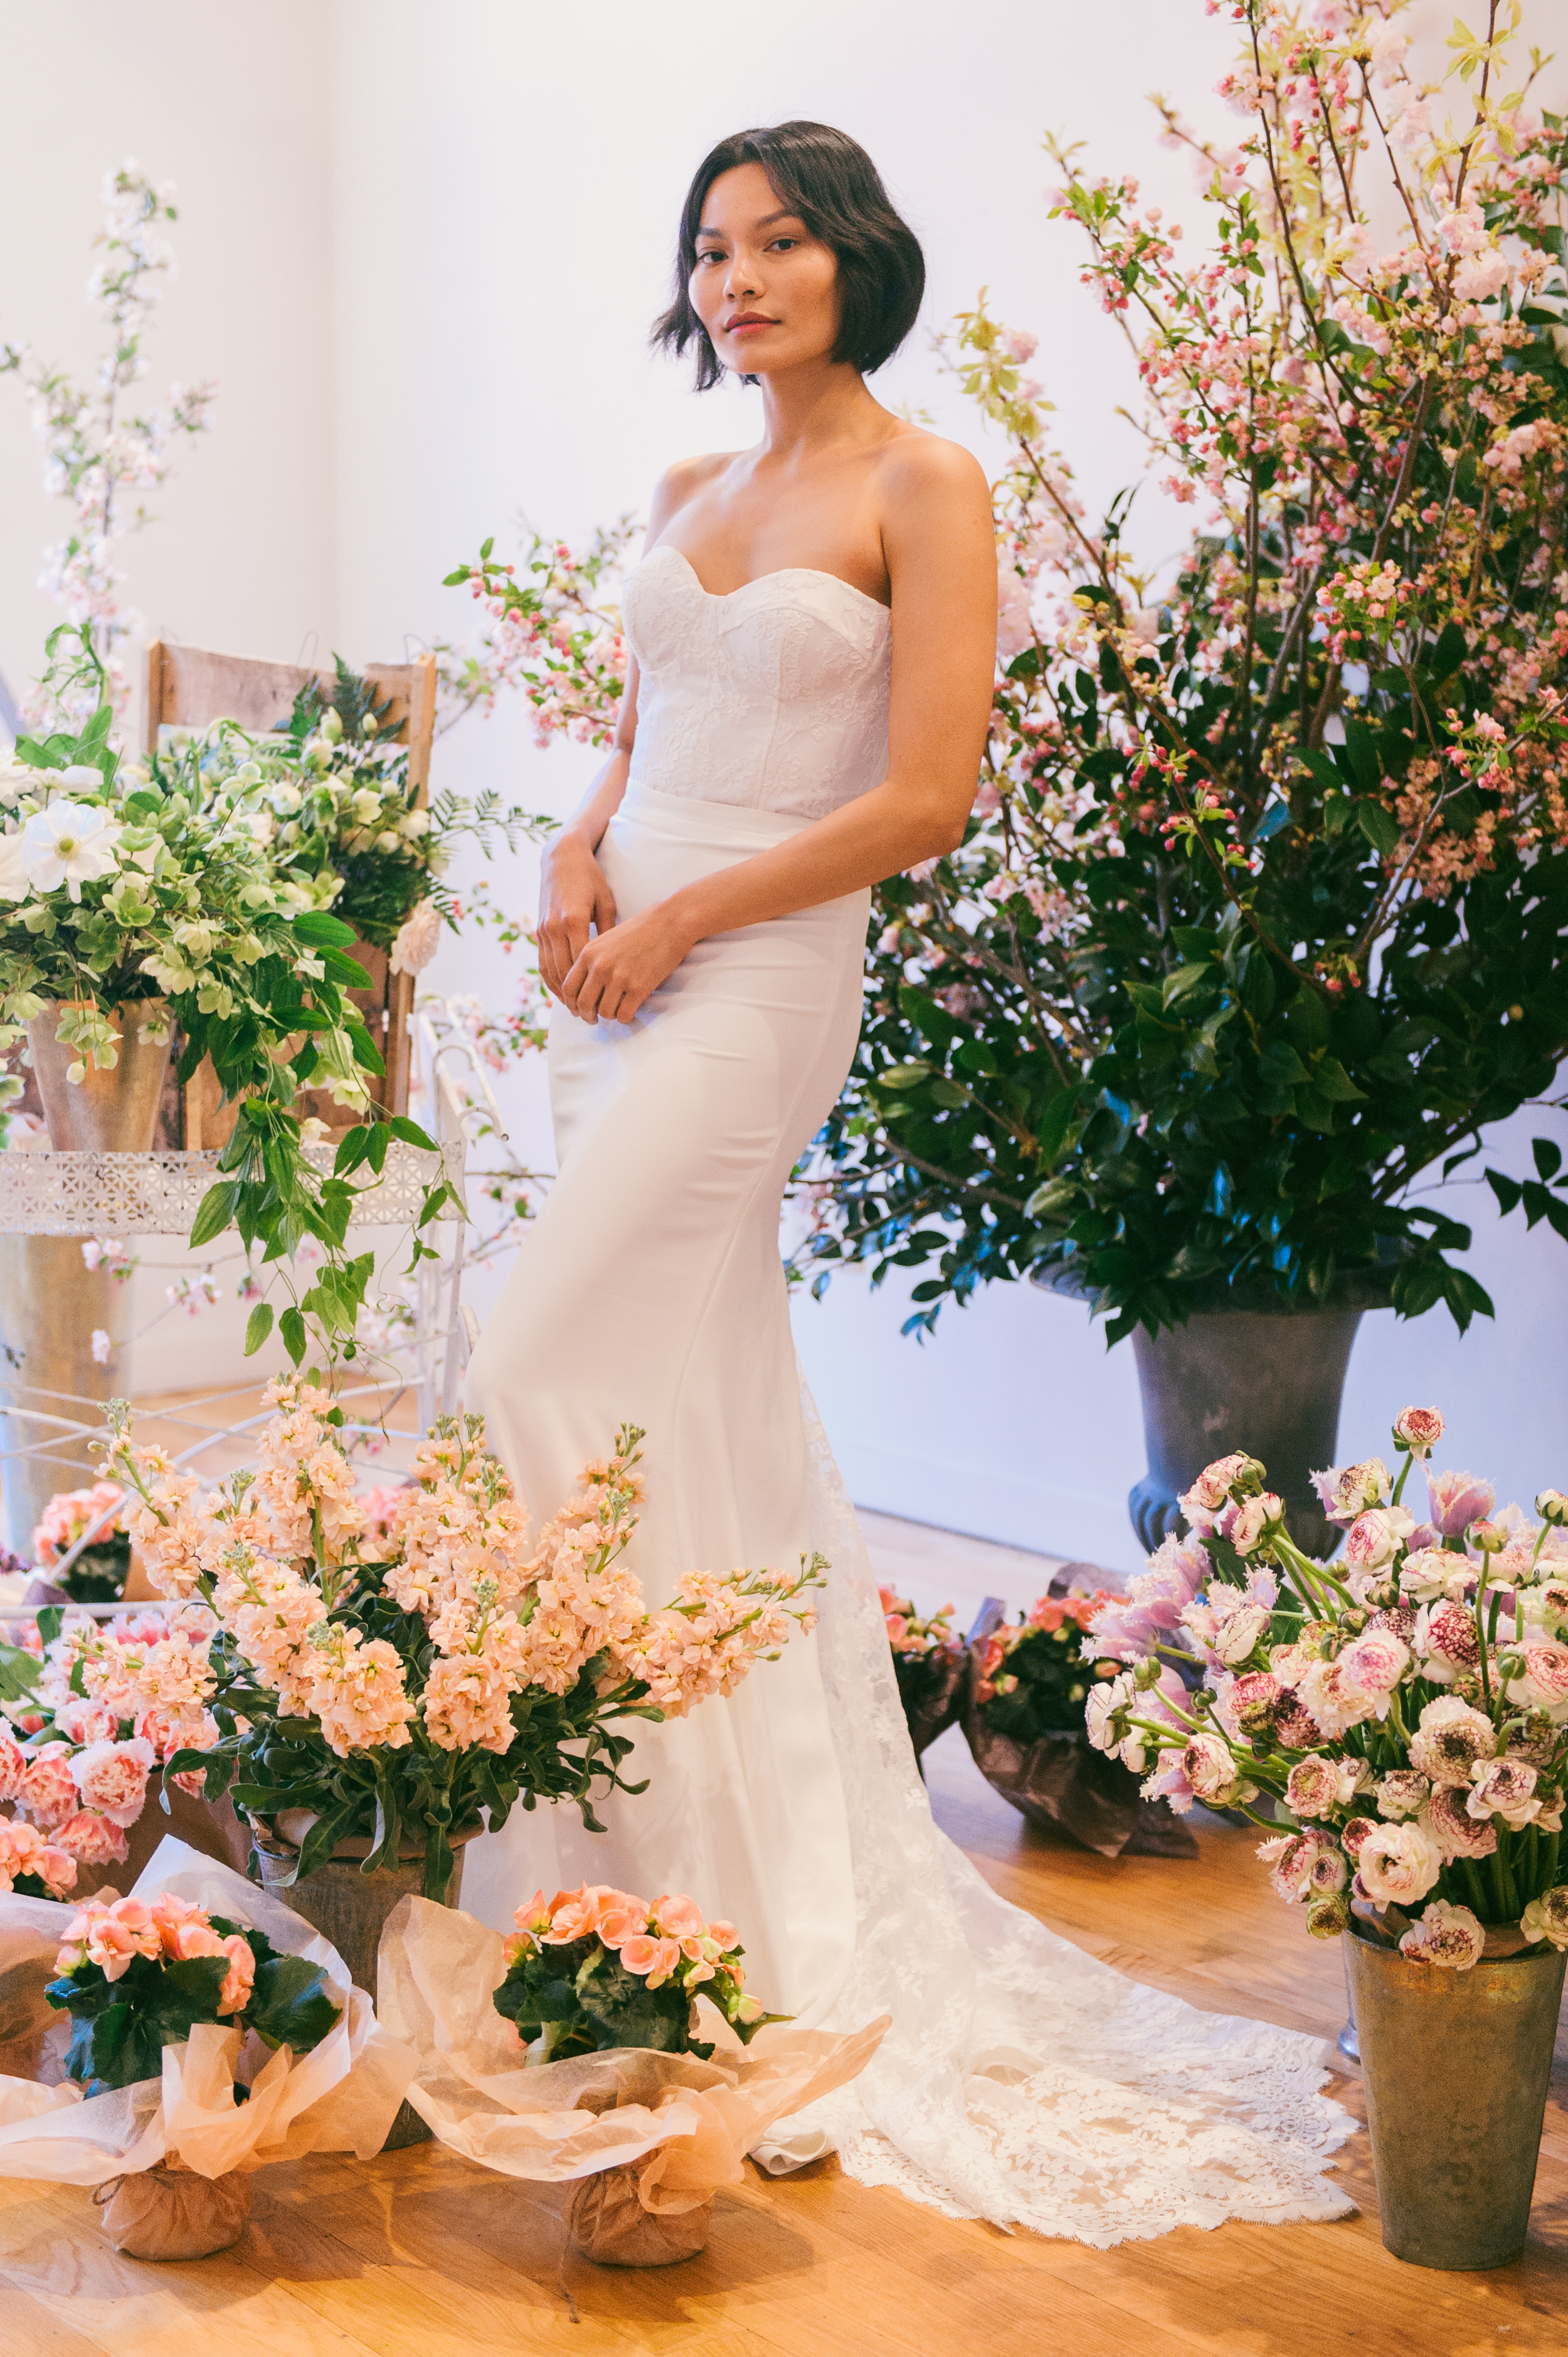 SarahSeven.Romantics.Bridal.8.jpg